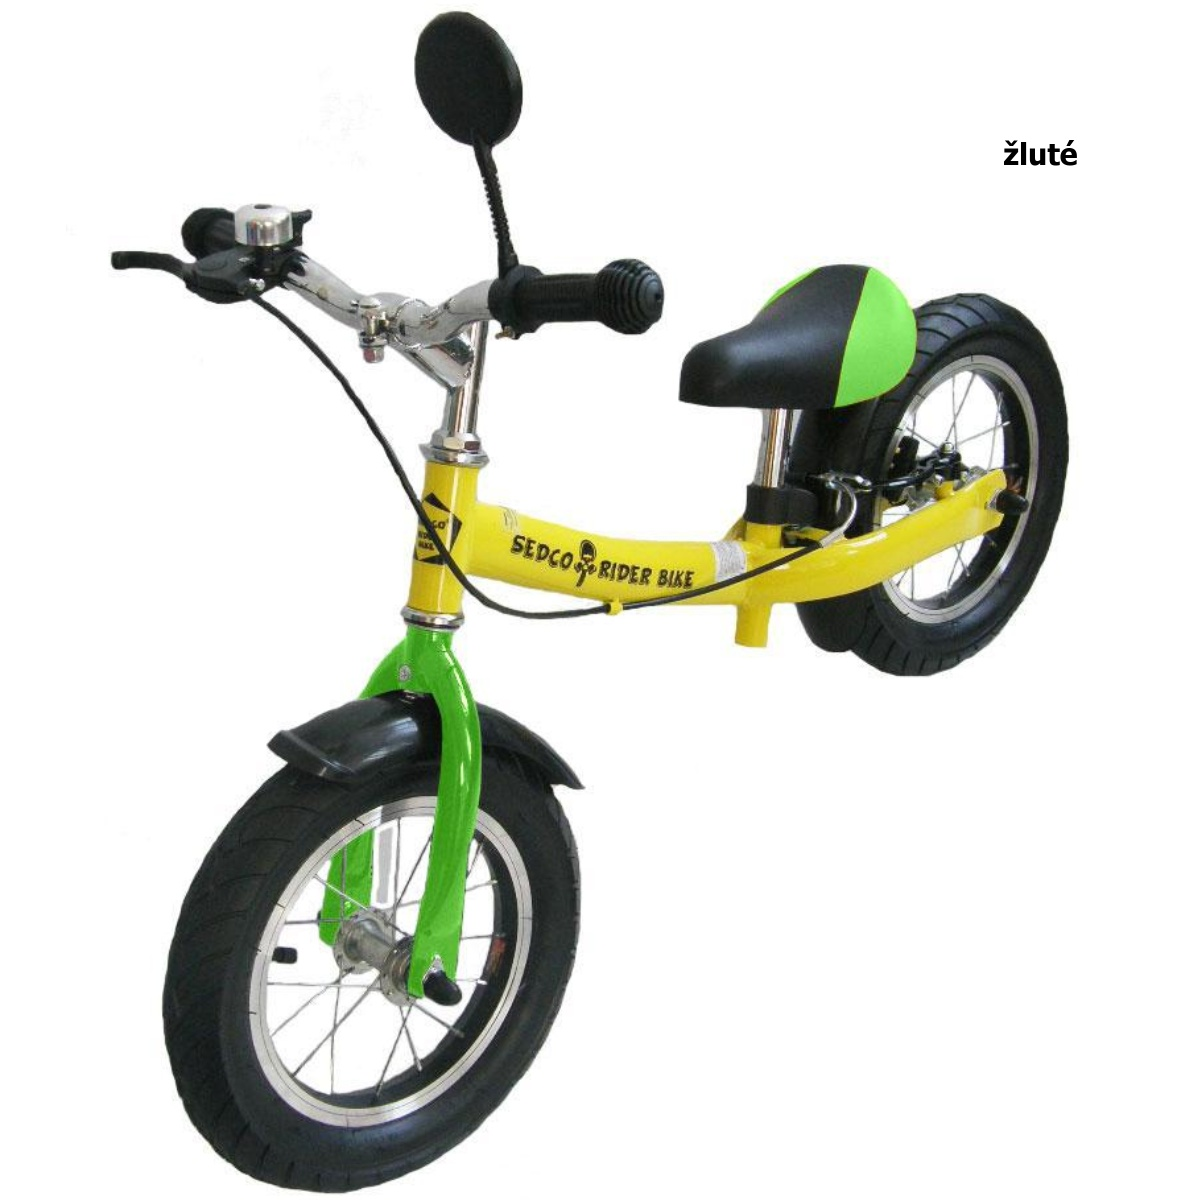 SEDCO Rider Cross NR3 - žlté